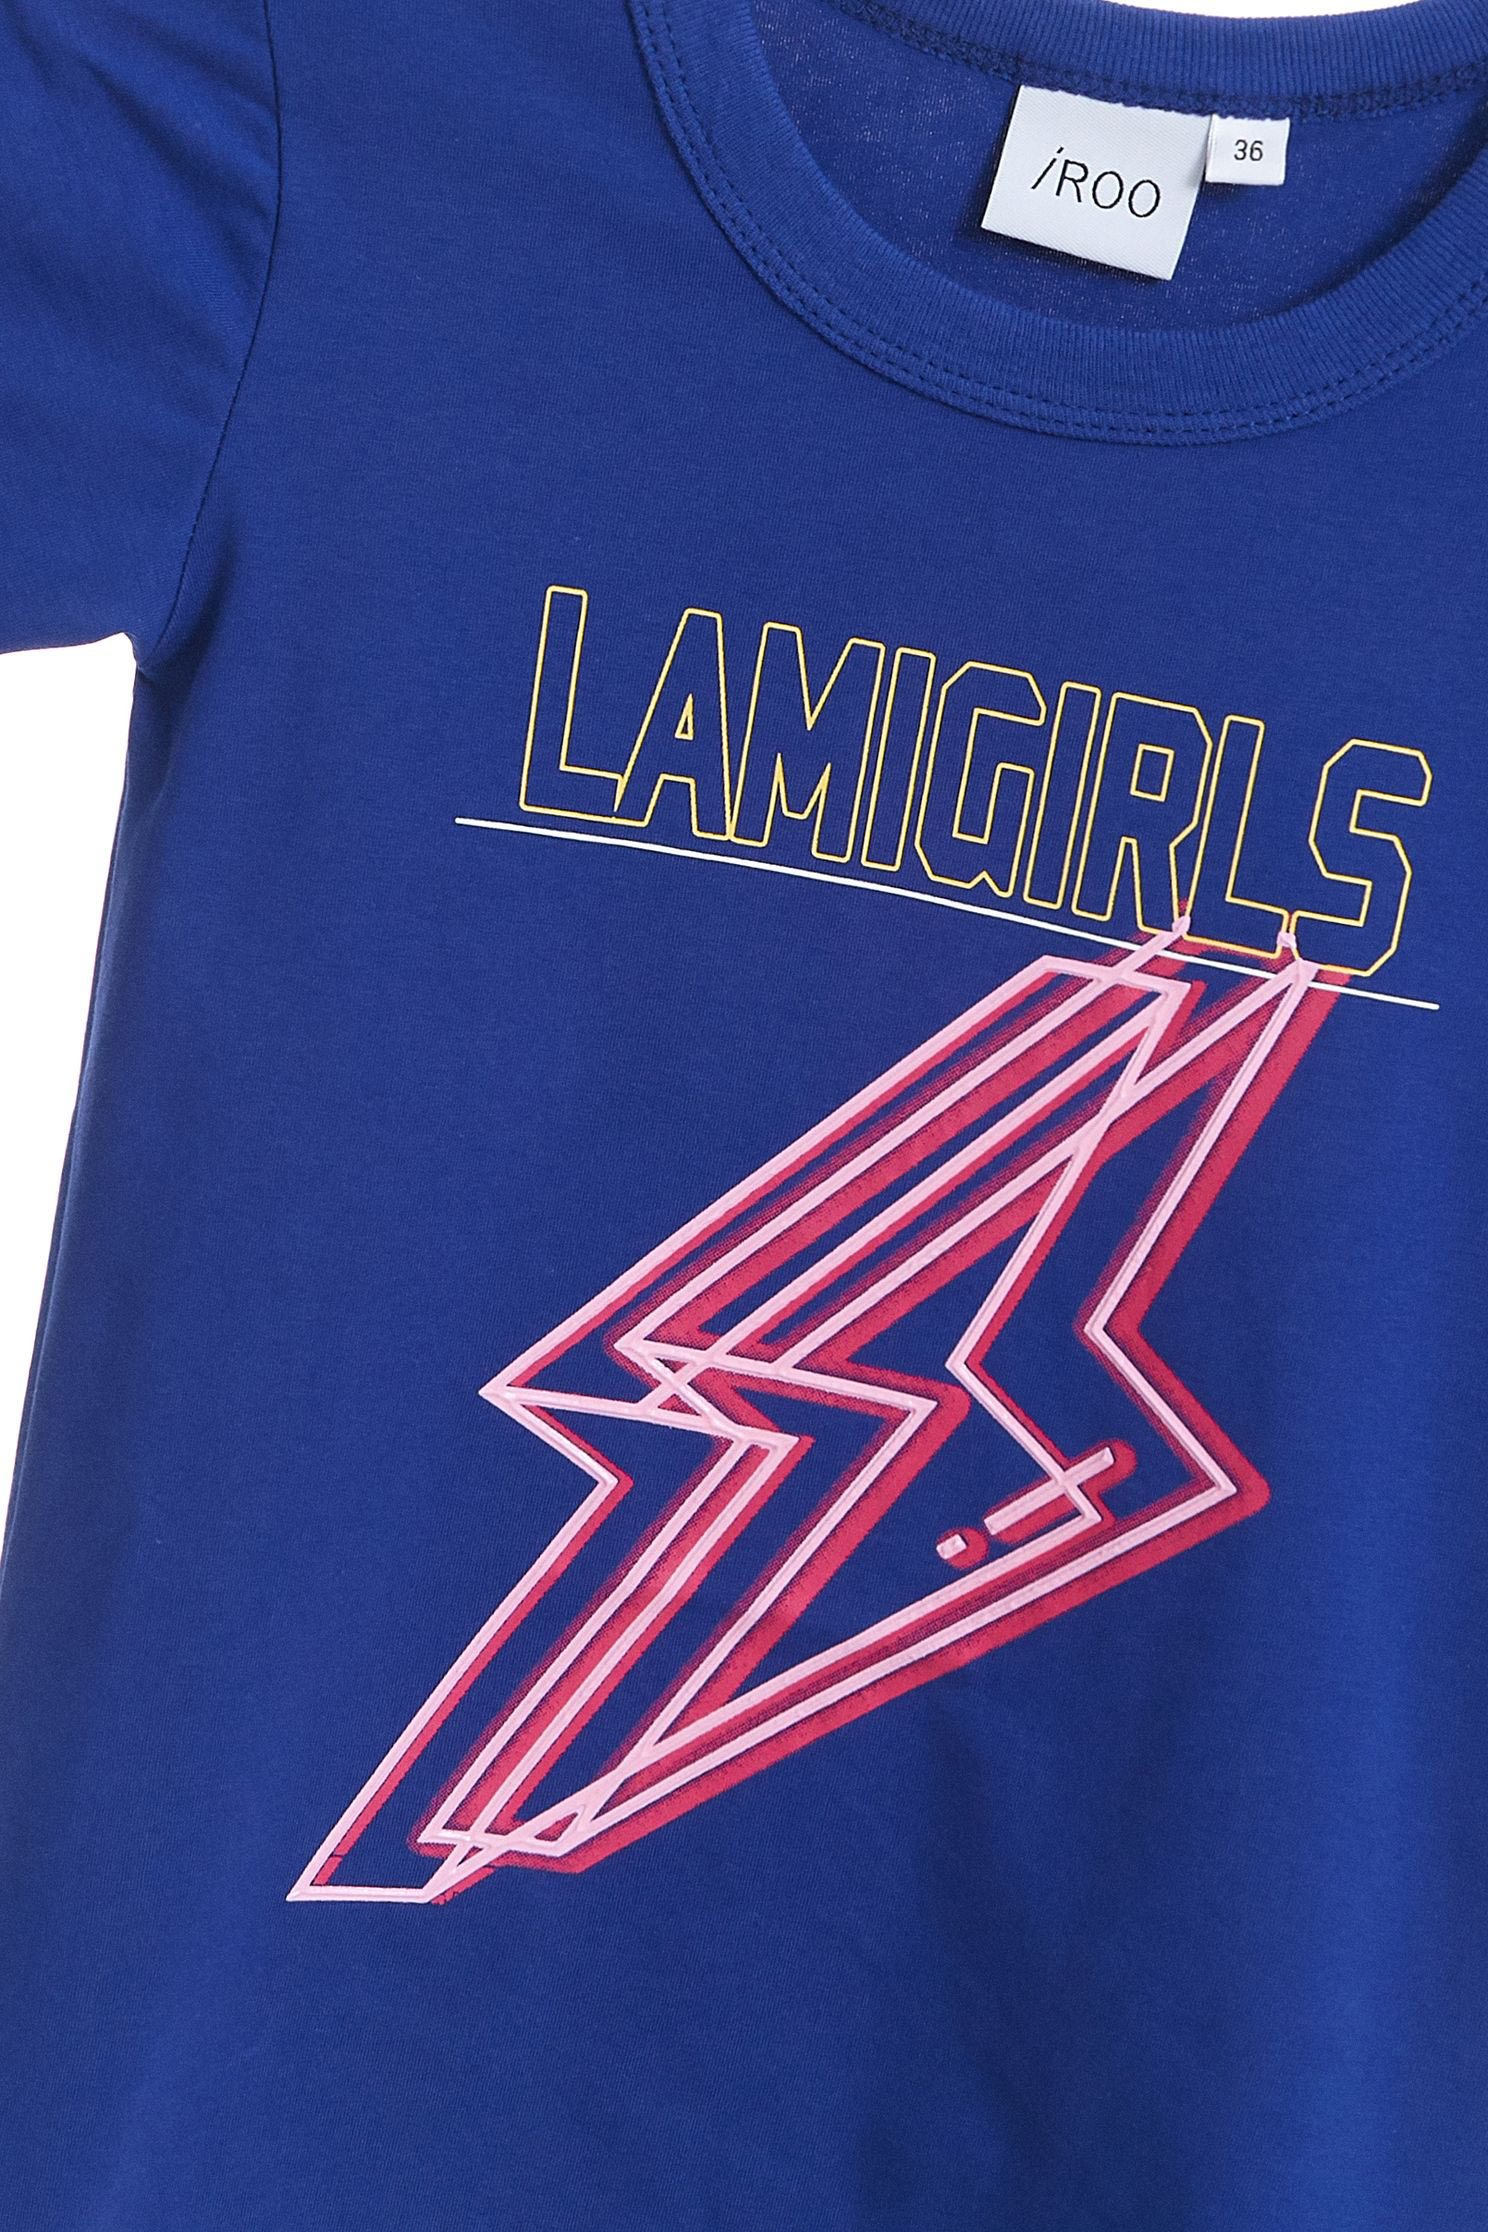 iRoo x LamiGirls Lightning Pop Cotton Short Sleeve Tshirt-kids